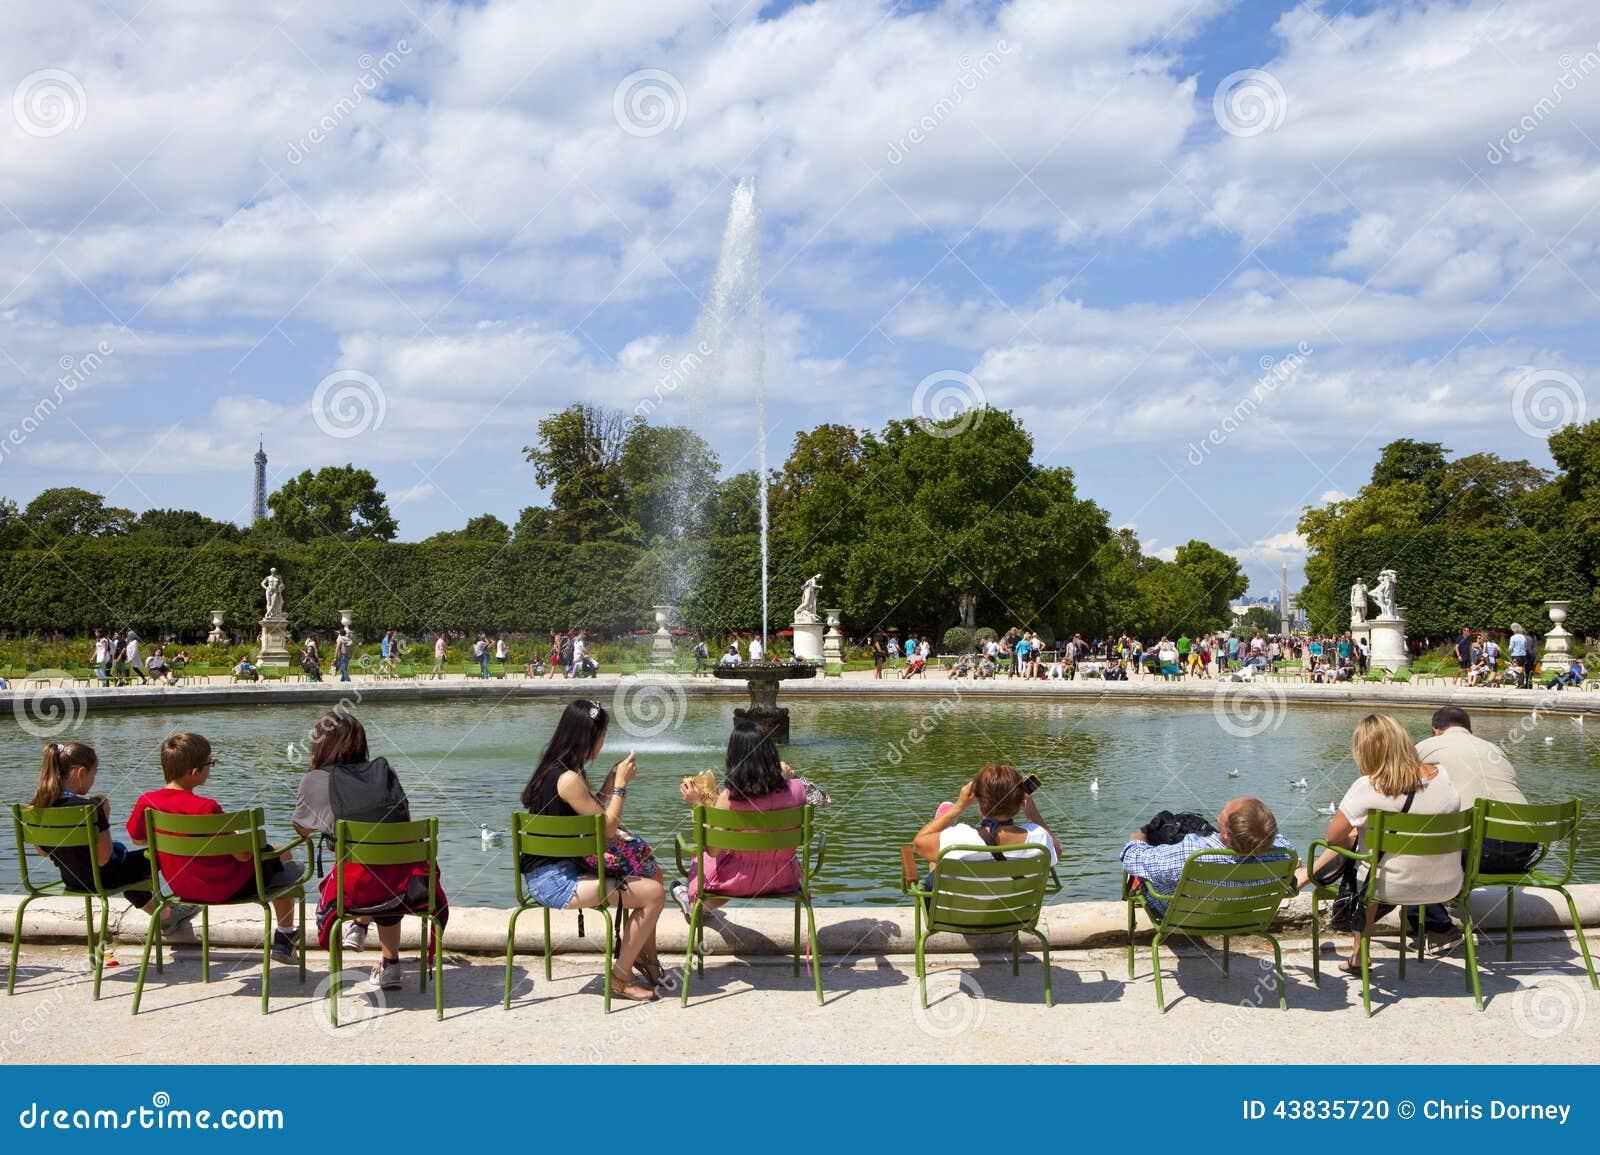 Jardin des tuileries in paris editorial image image for Jardin de france